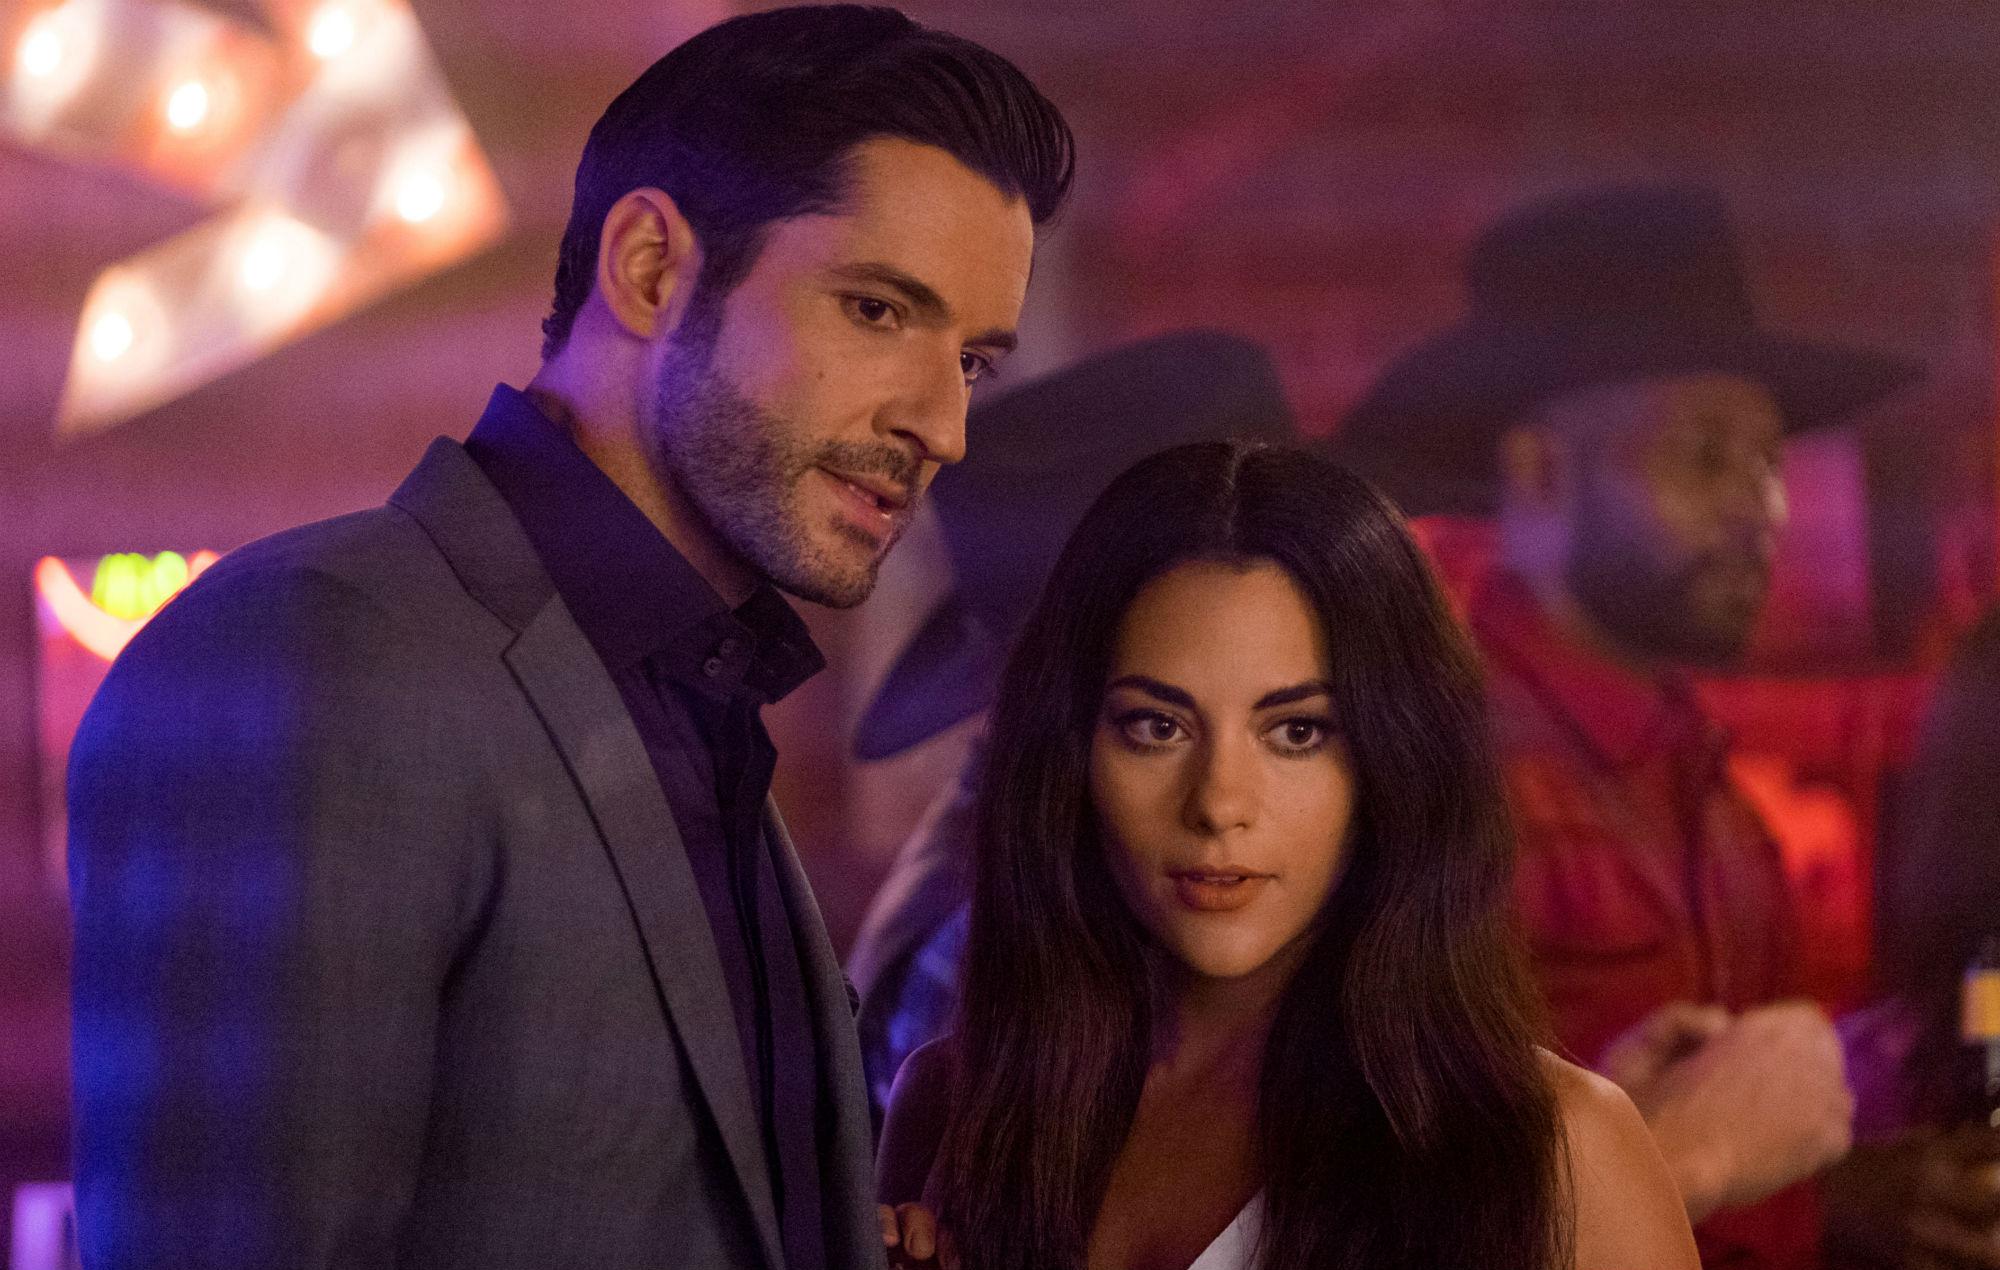 'Lucifer' drops new teaser for season 5 half 2